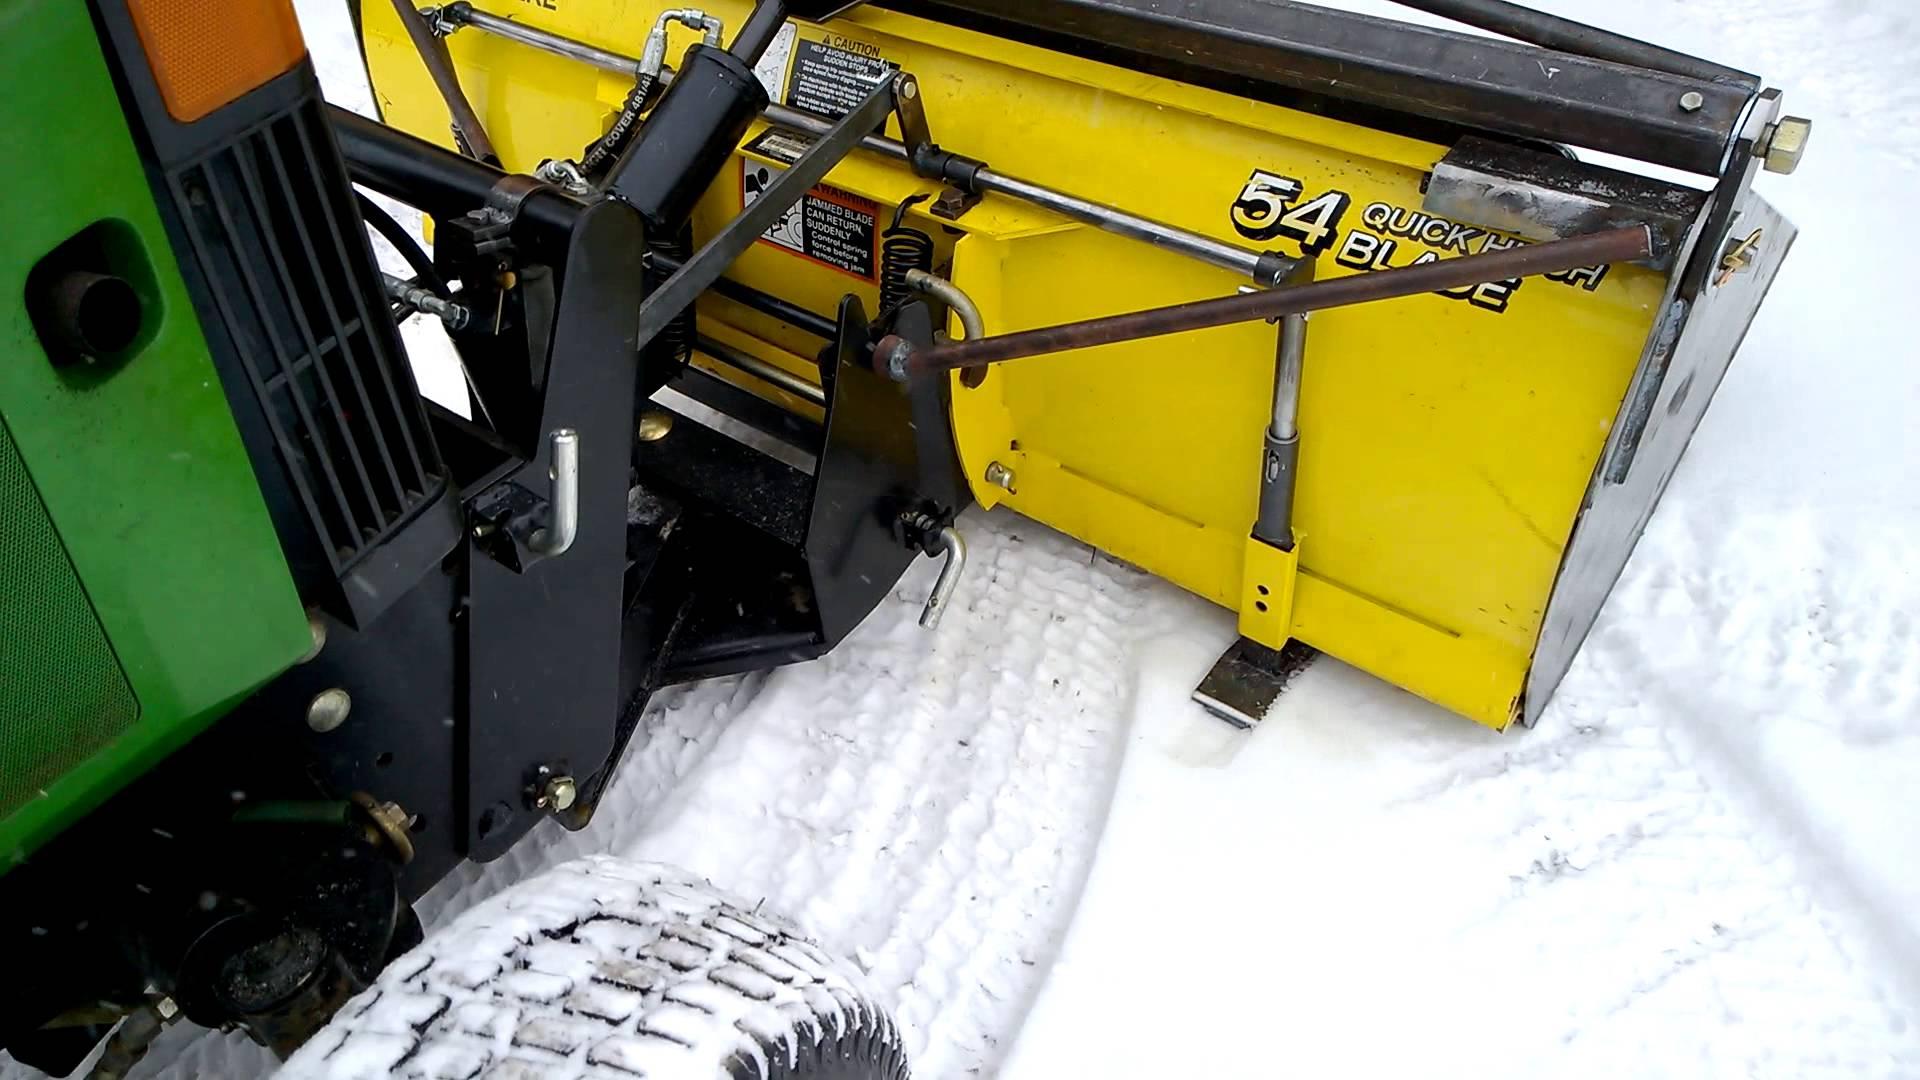 John Deere 54 Plow with bucket demonstrating lock - YouTube